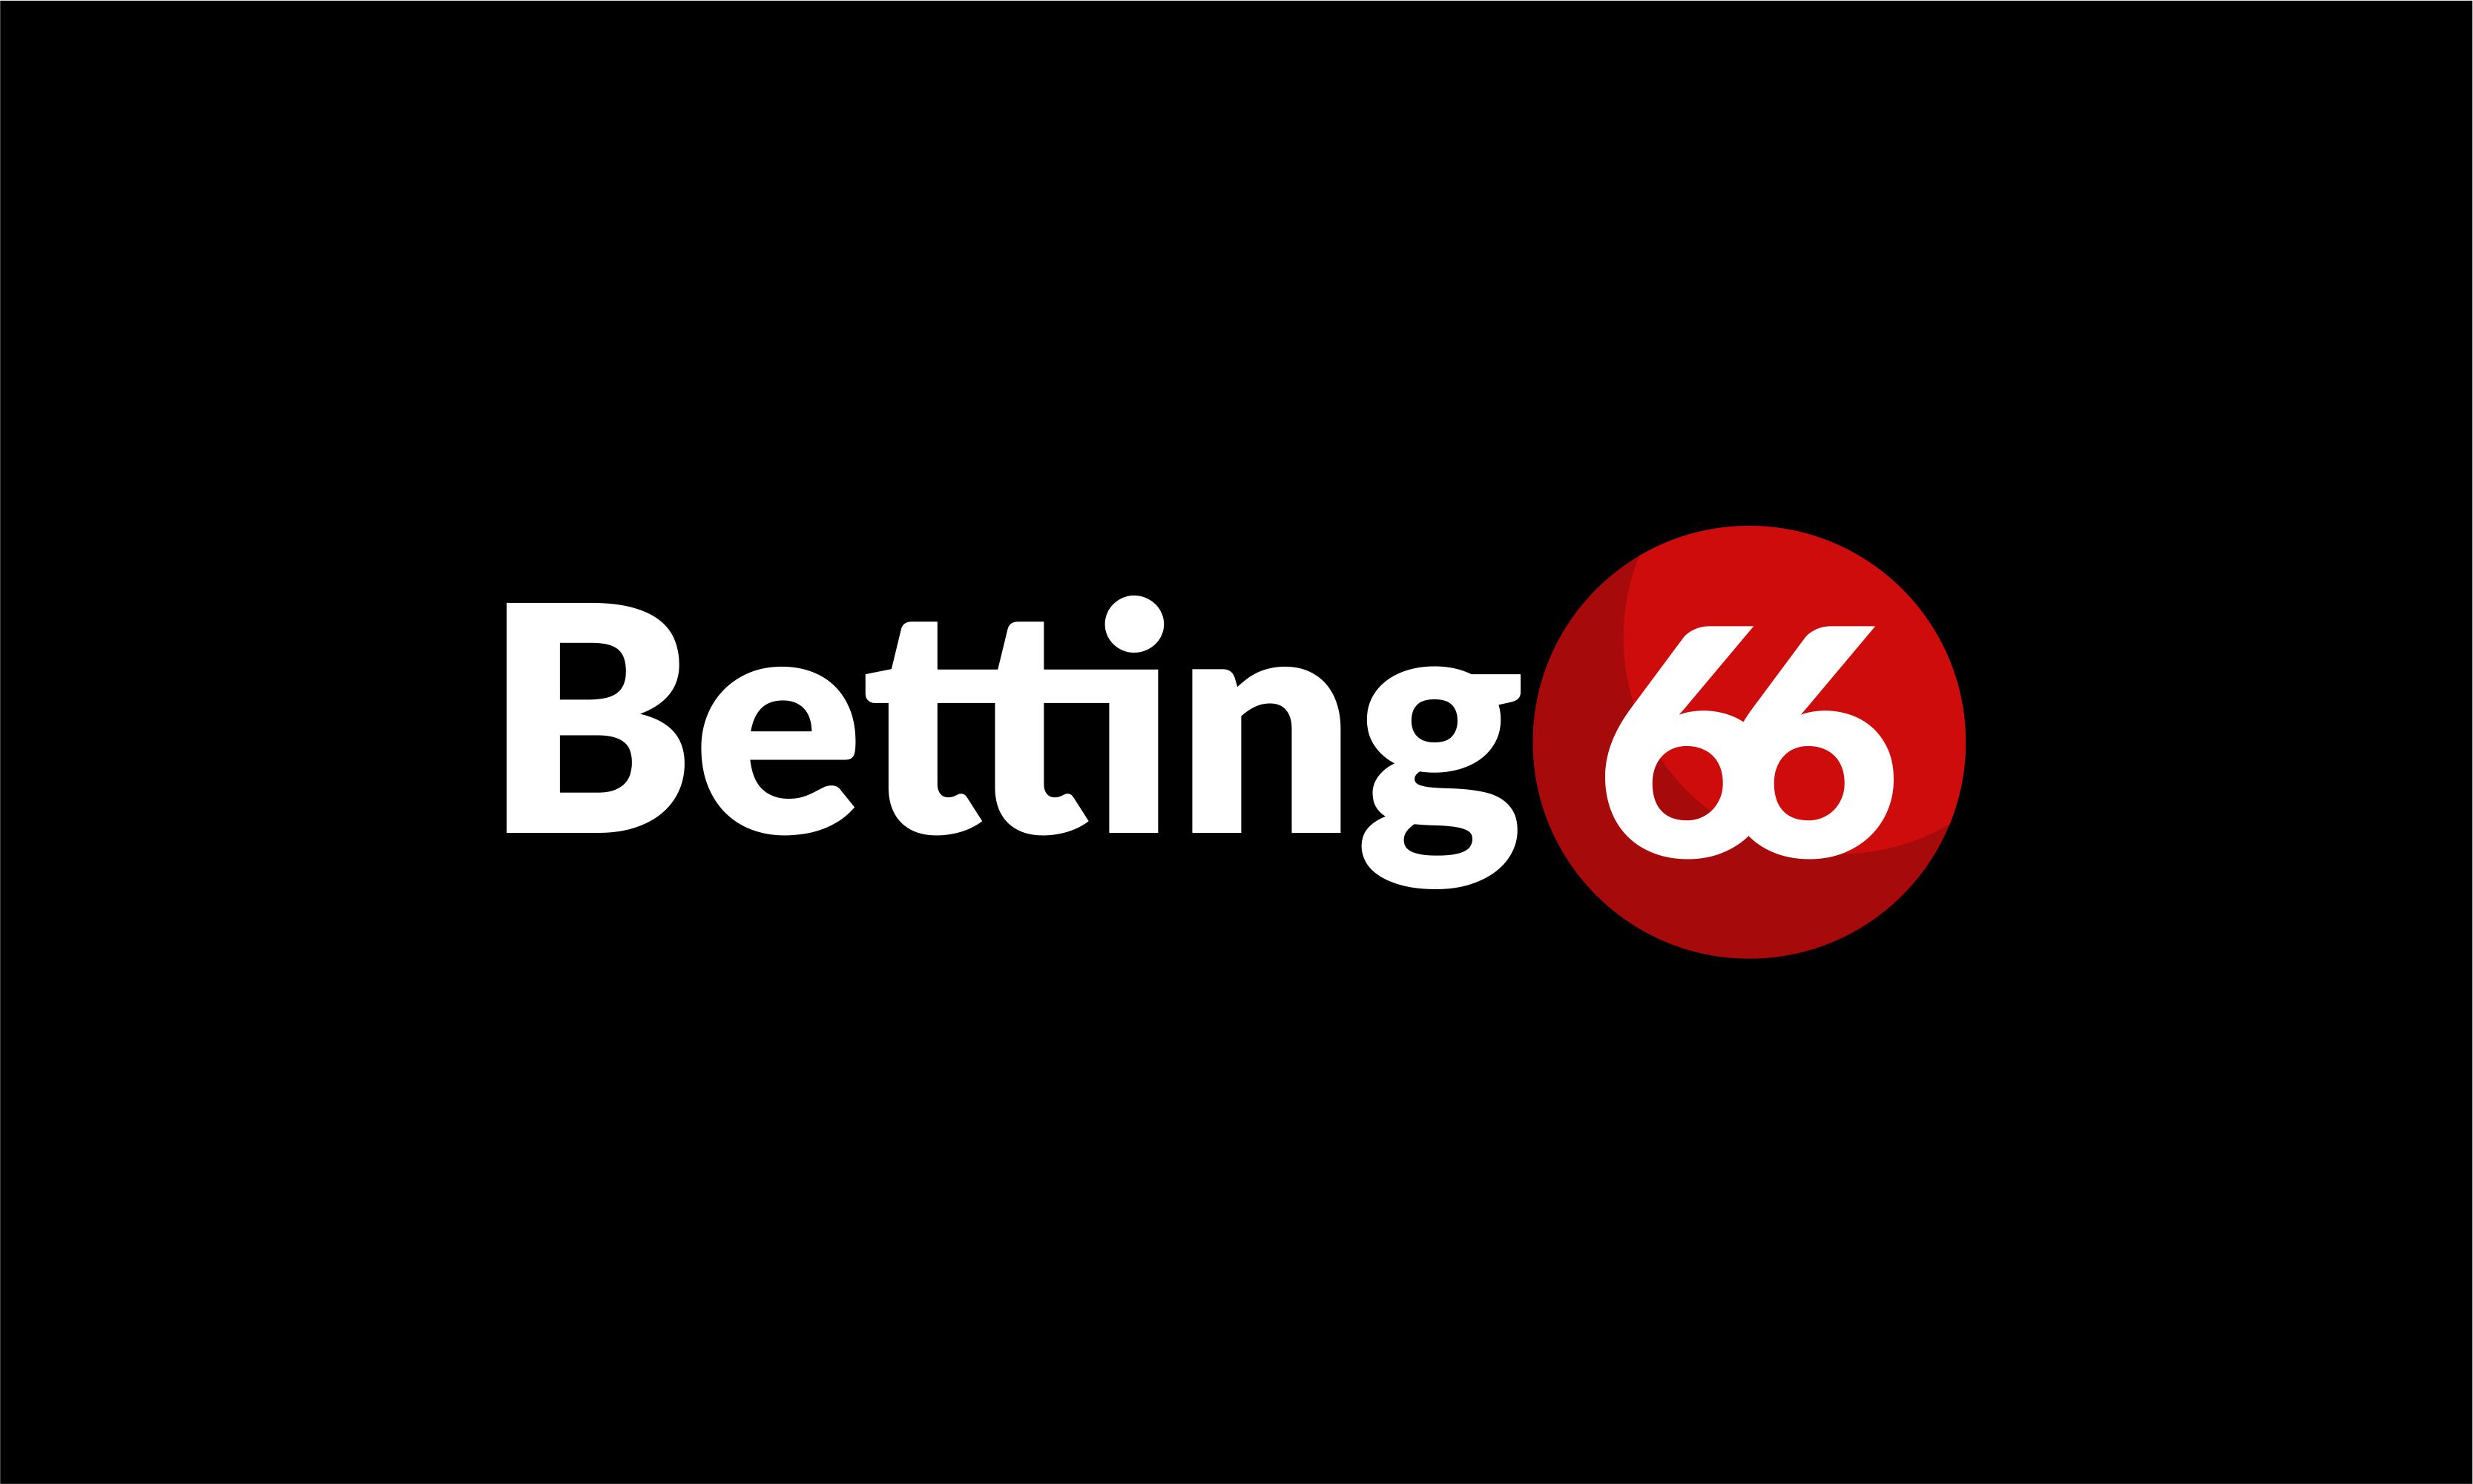 Betting66